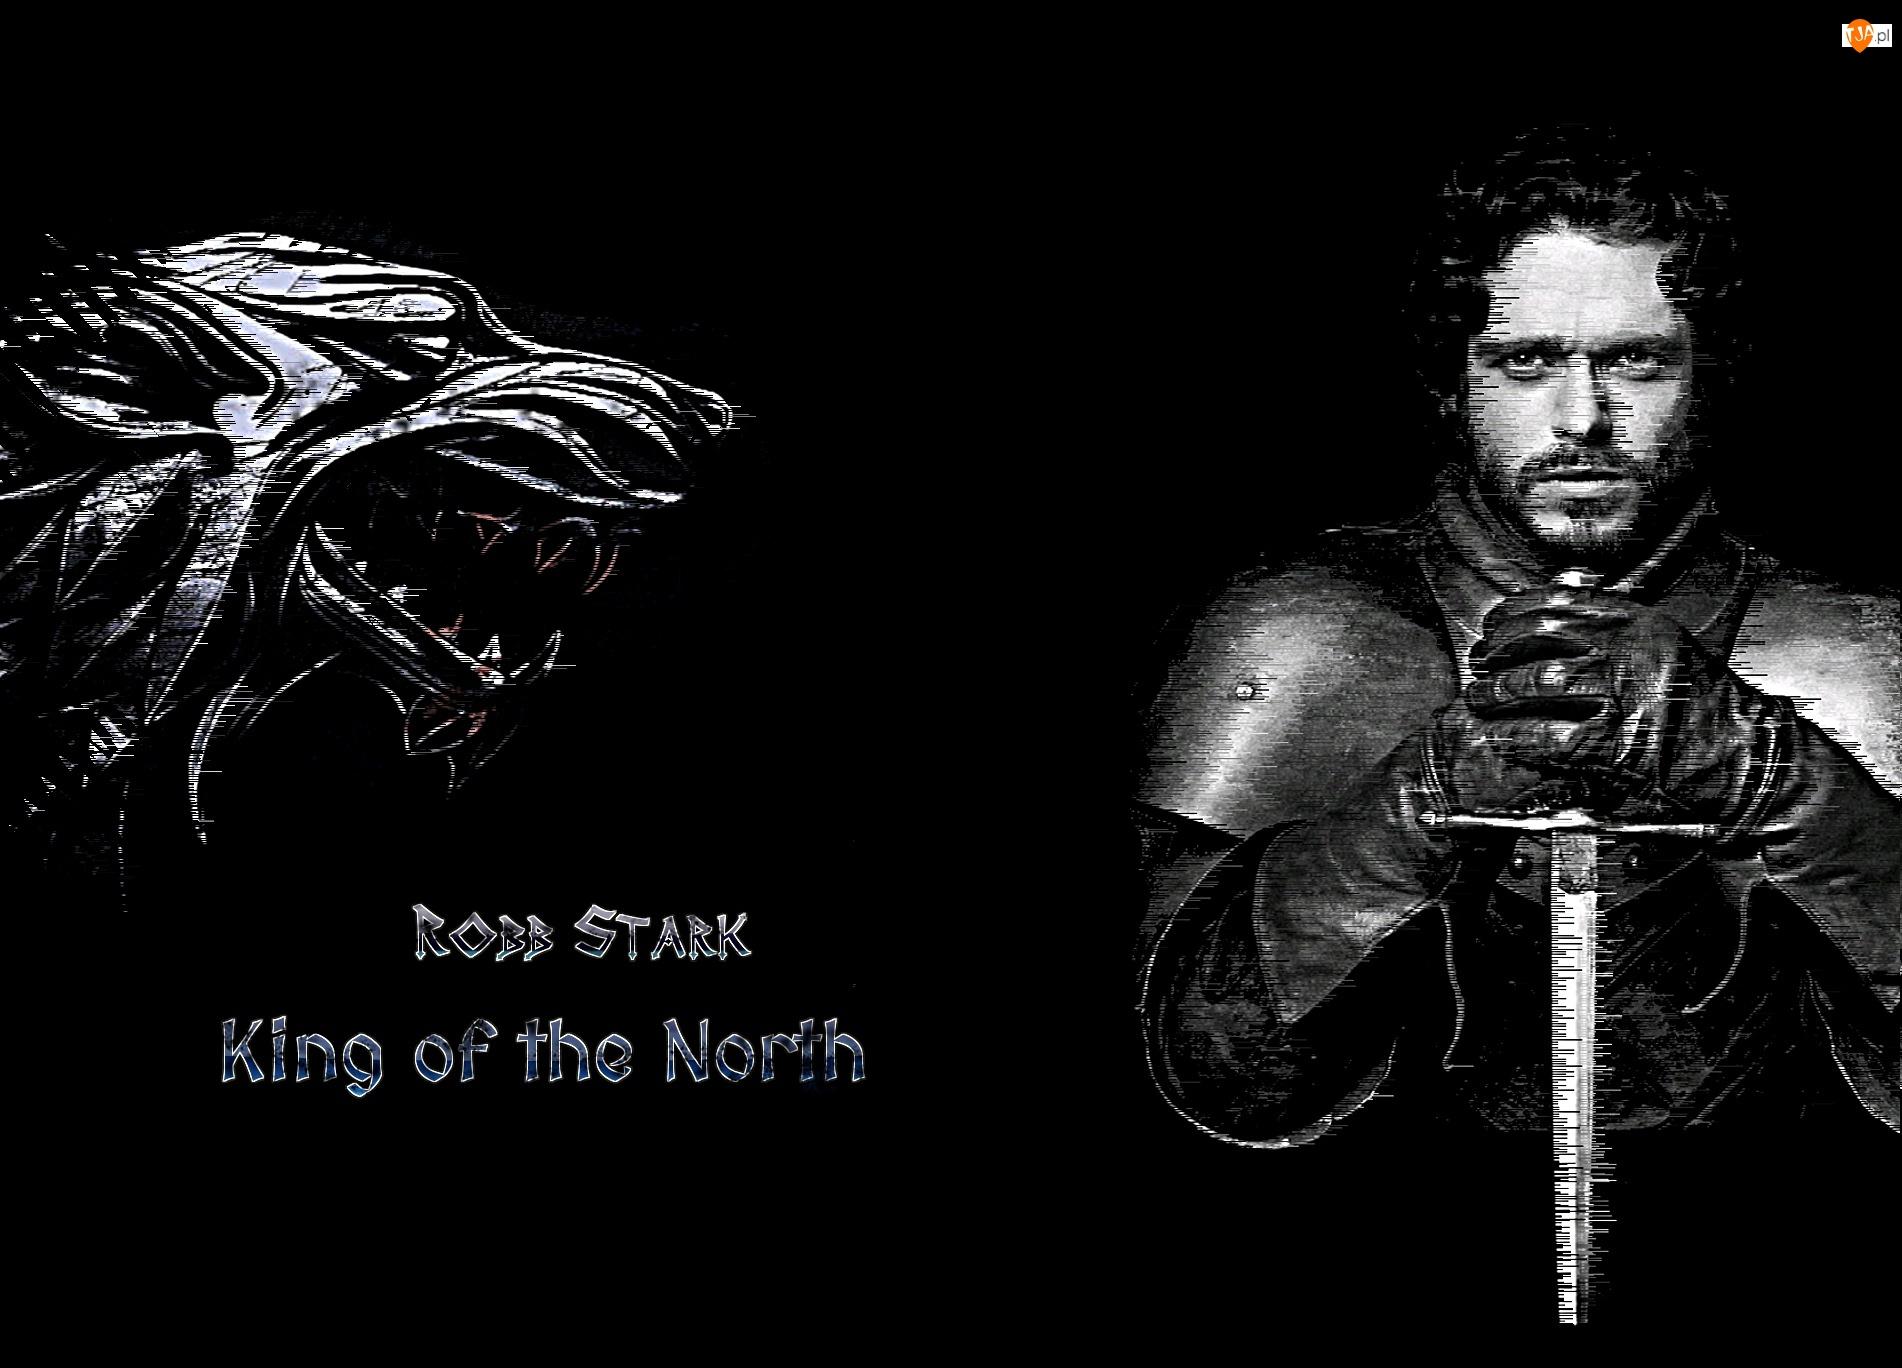 Wilk, Gra o tron, Game of Thrones, Robb Stark